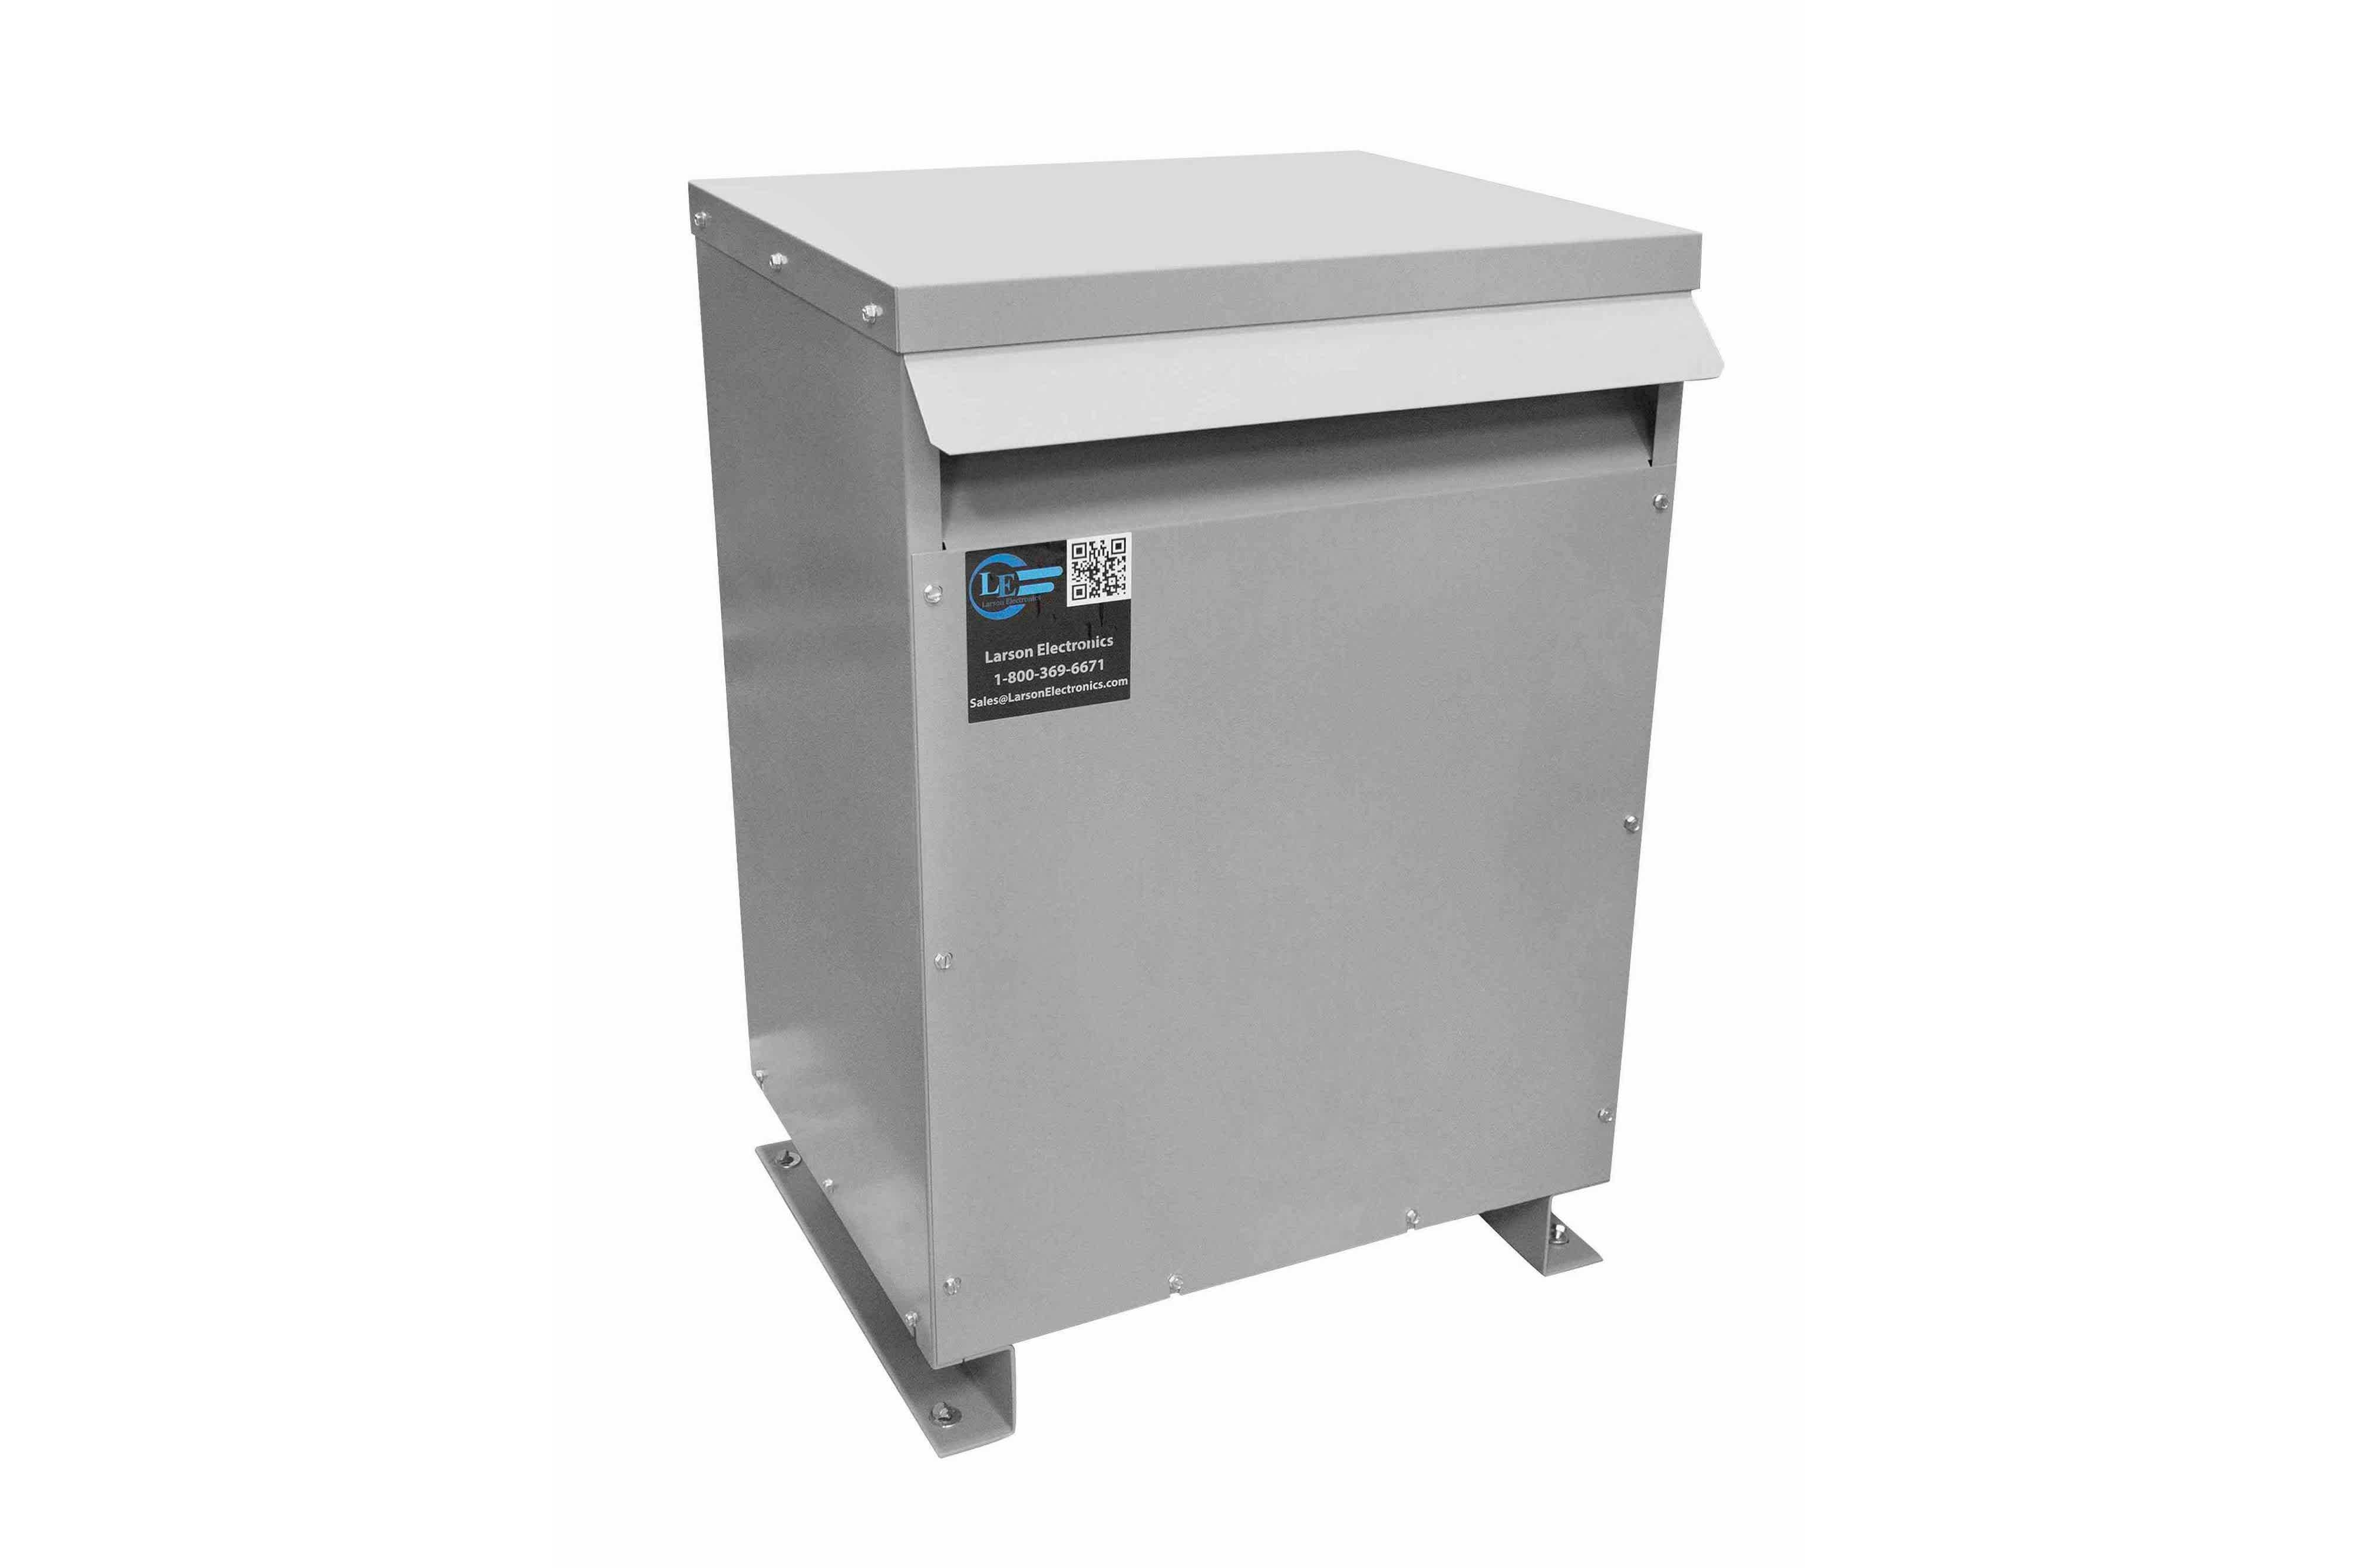 15 kVA 3PH Isolation Transformer, 240V Wye Primary, 380V Delta Secondary, N3R, Ventilated, 60 Hz